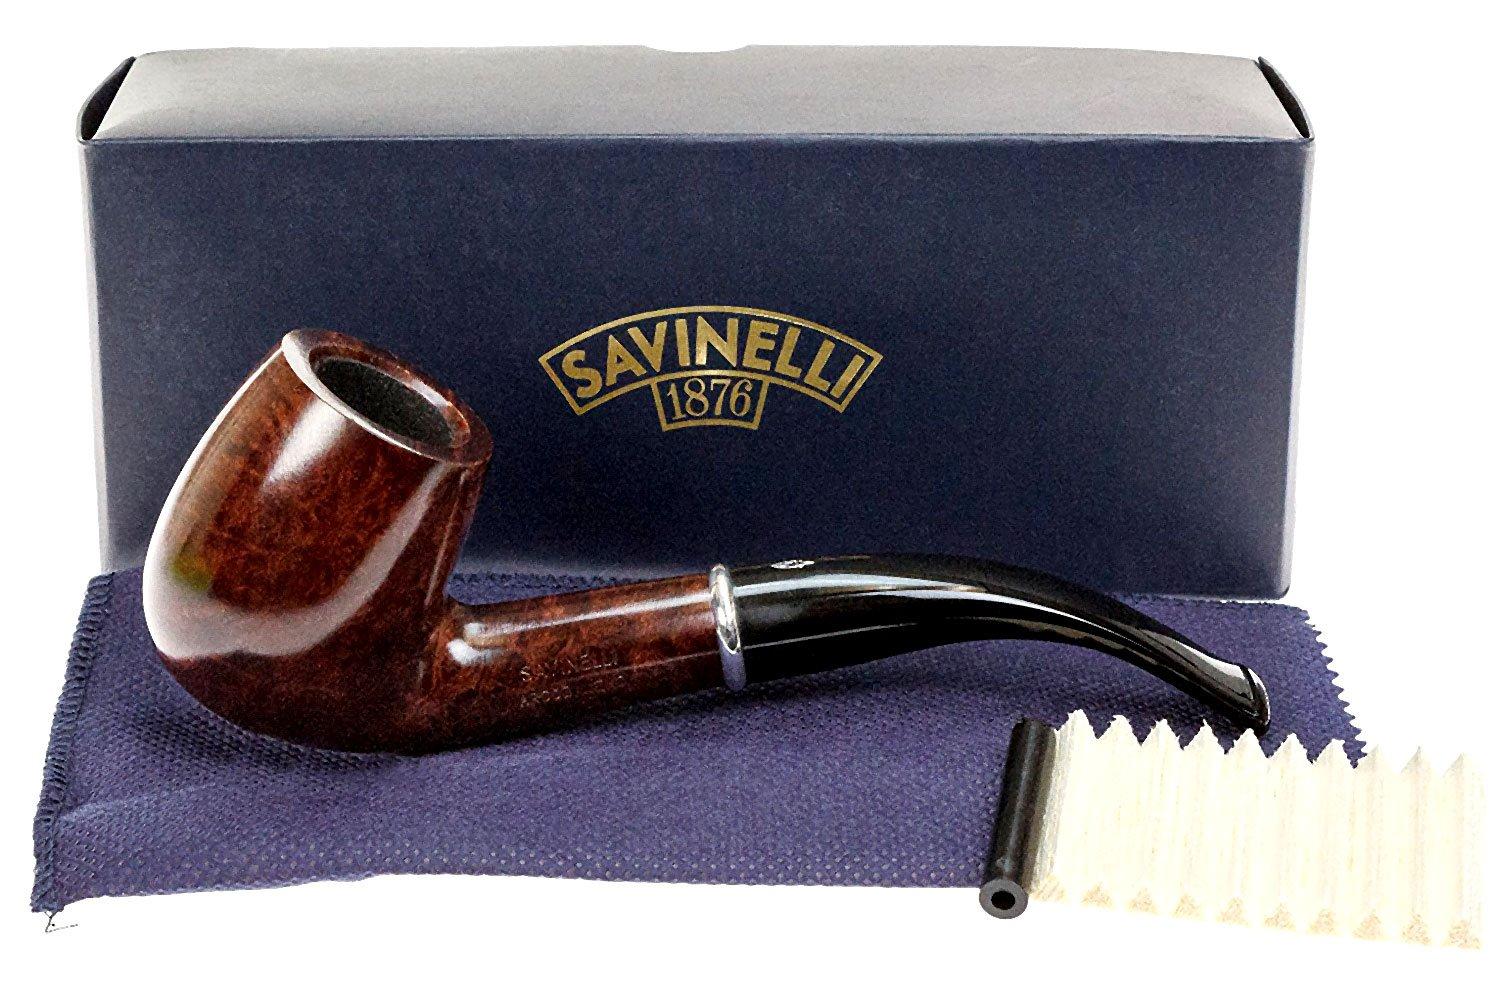 Savinelli Italian Tobacco Smoking Pipes, Arcobaleno Smooth Brown 606